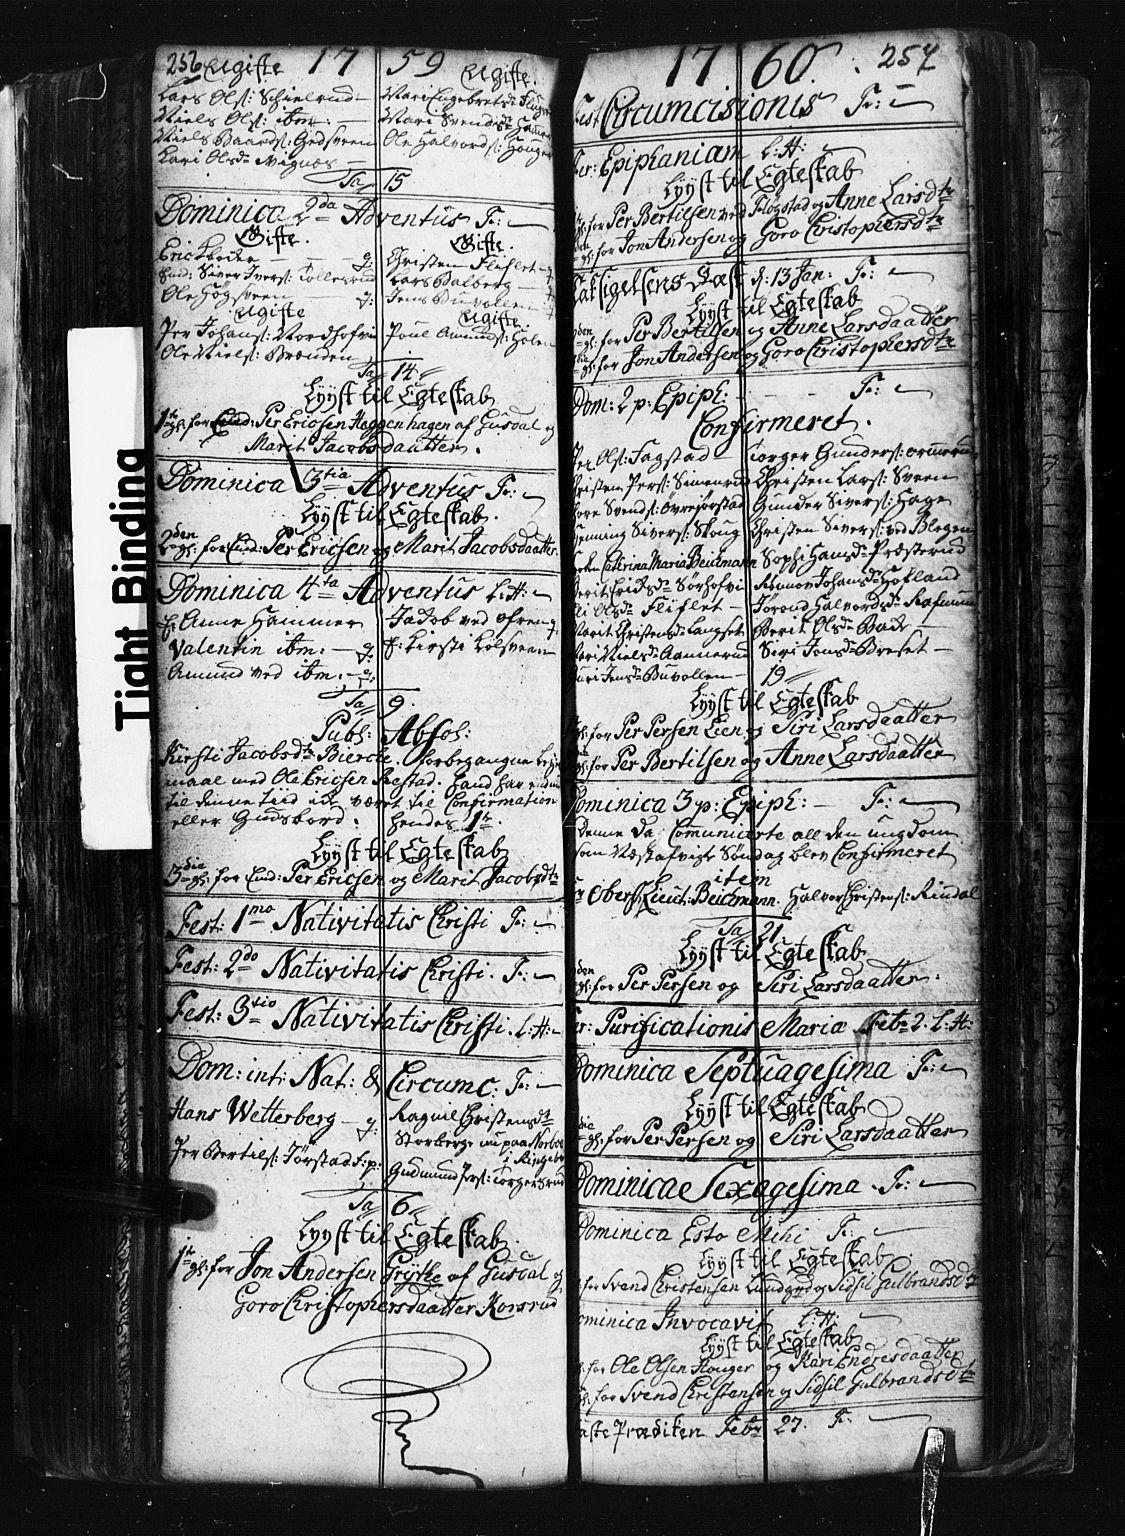 SAH, Fåberg prestekontor, Klokkerbok nr. 1, 1727-1767, s. 256-257